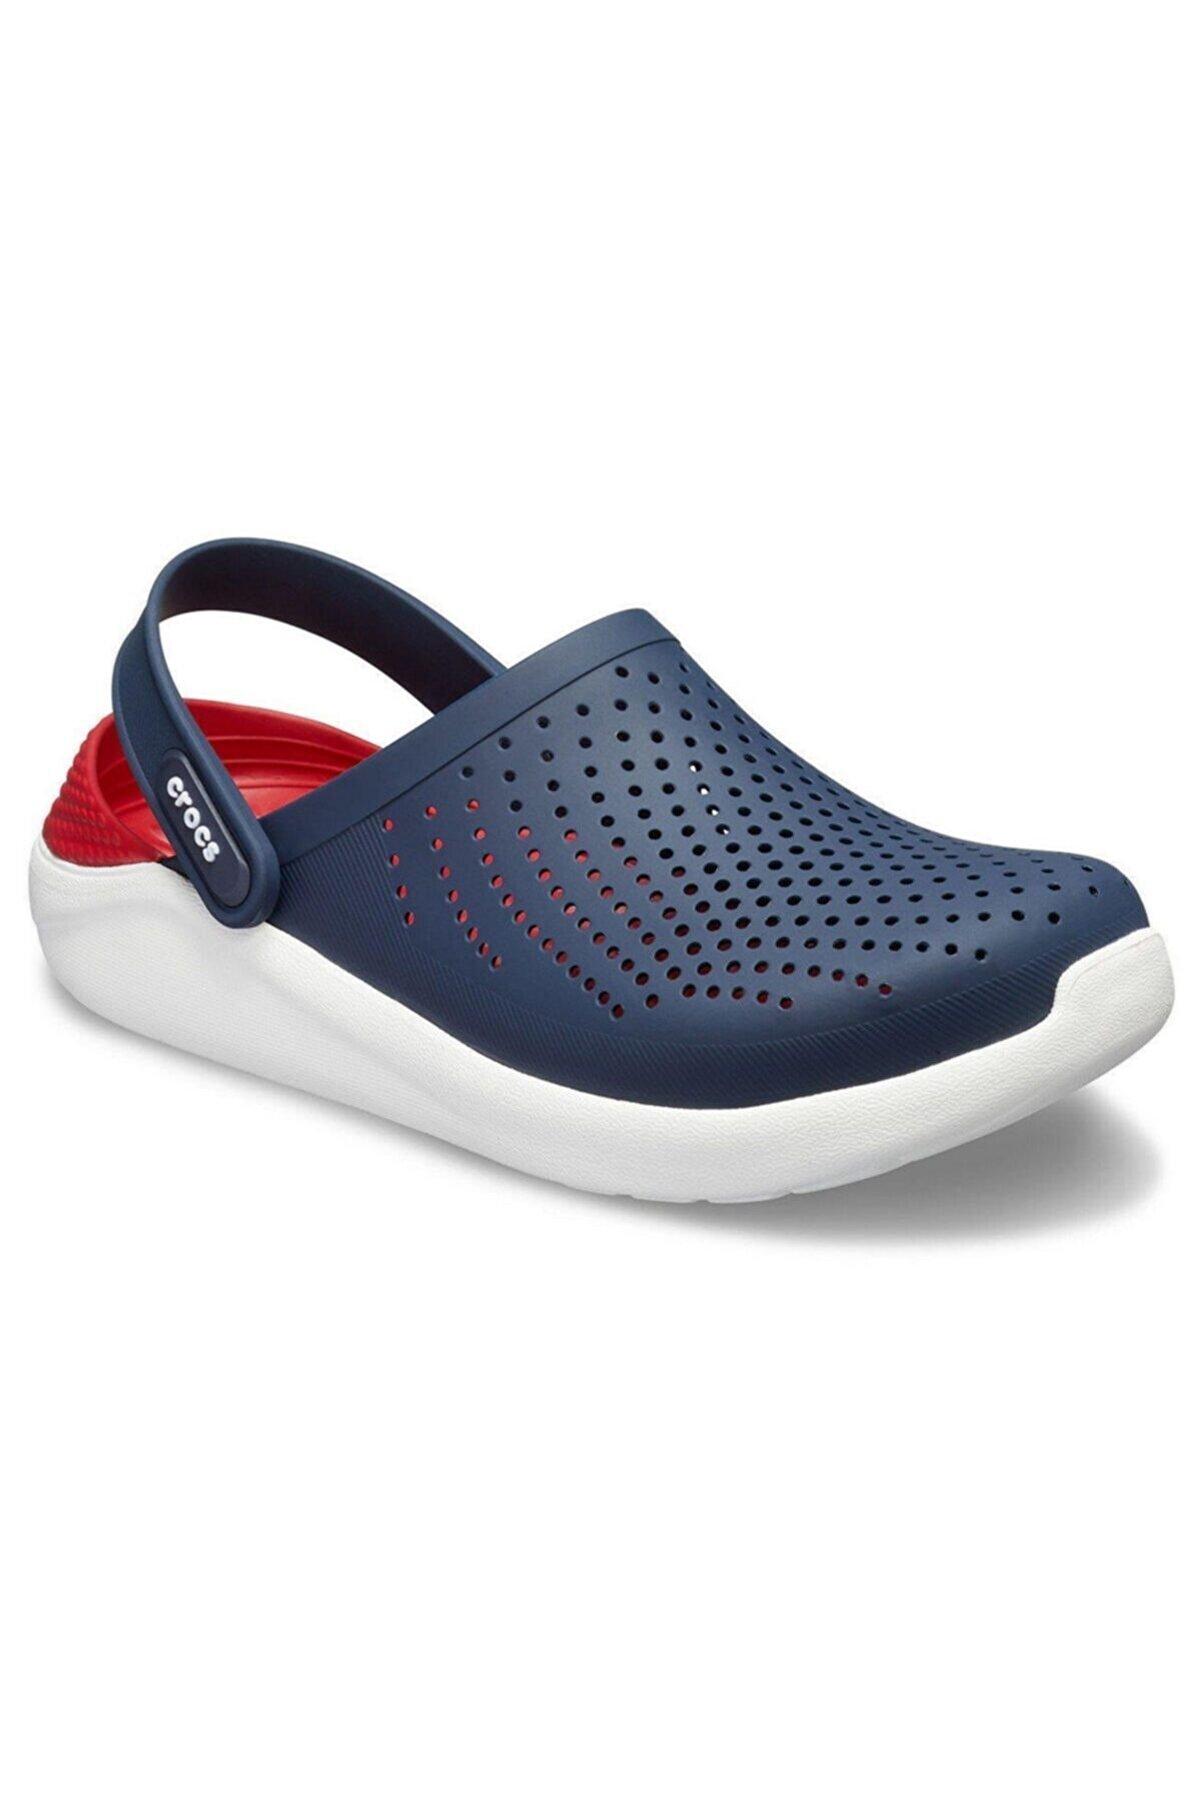 Crocs Clog Strap Spor Terlik 204592-4cc